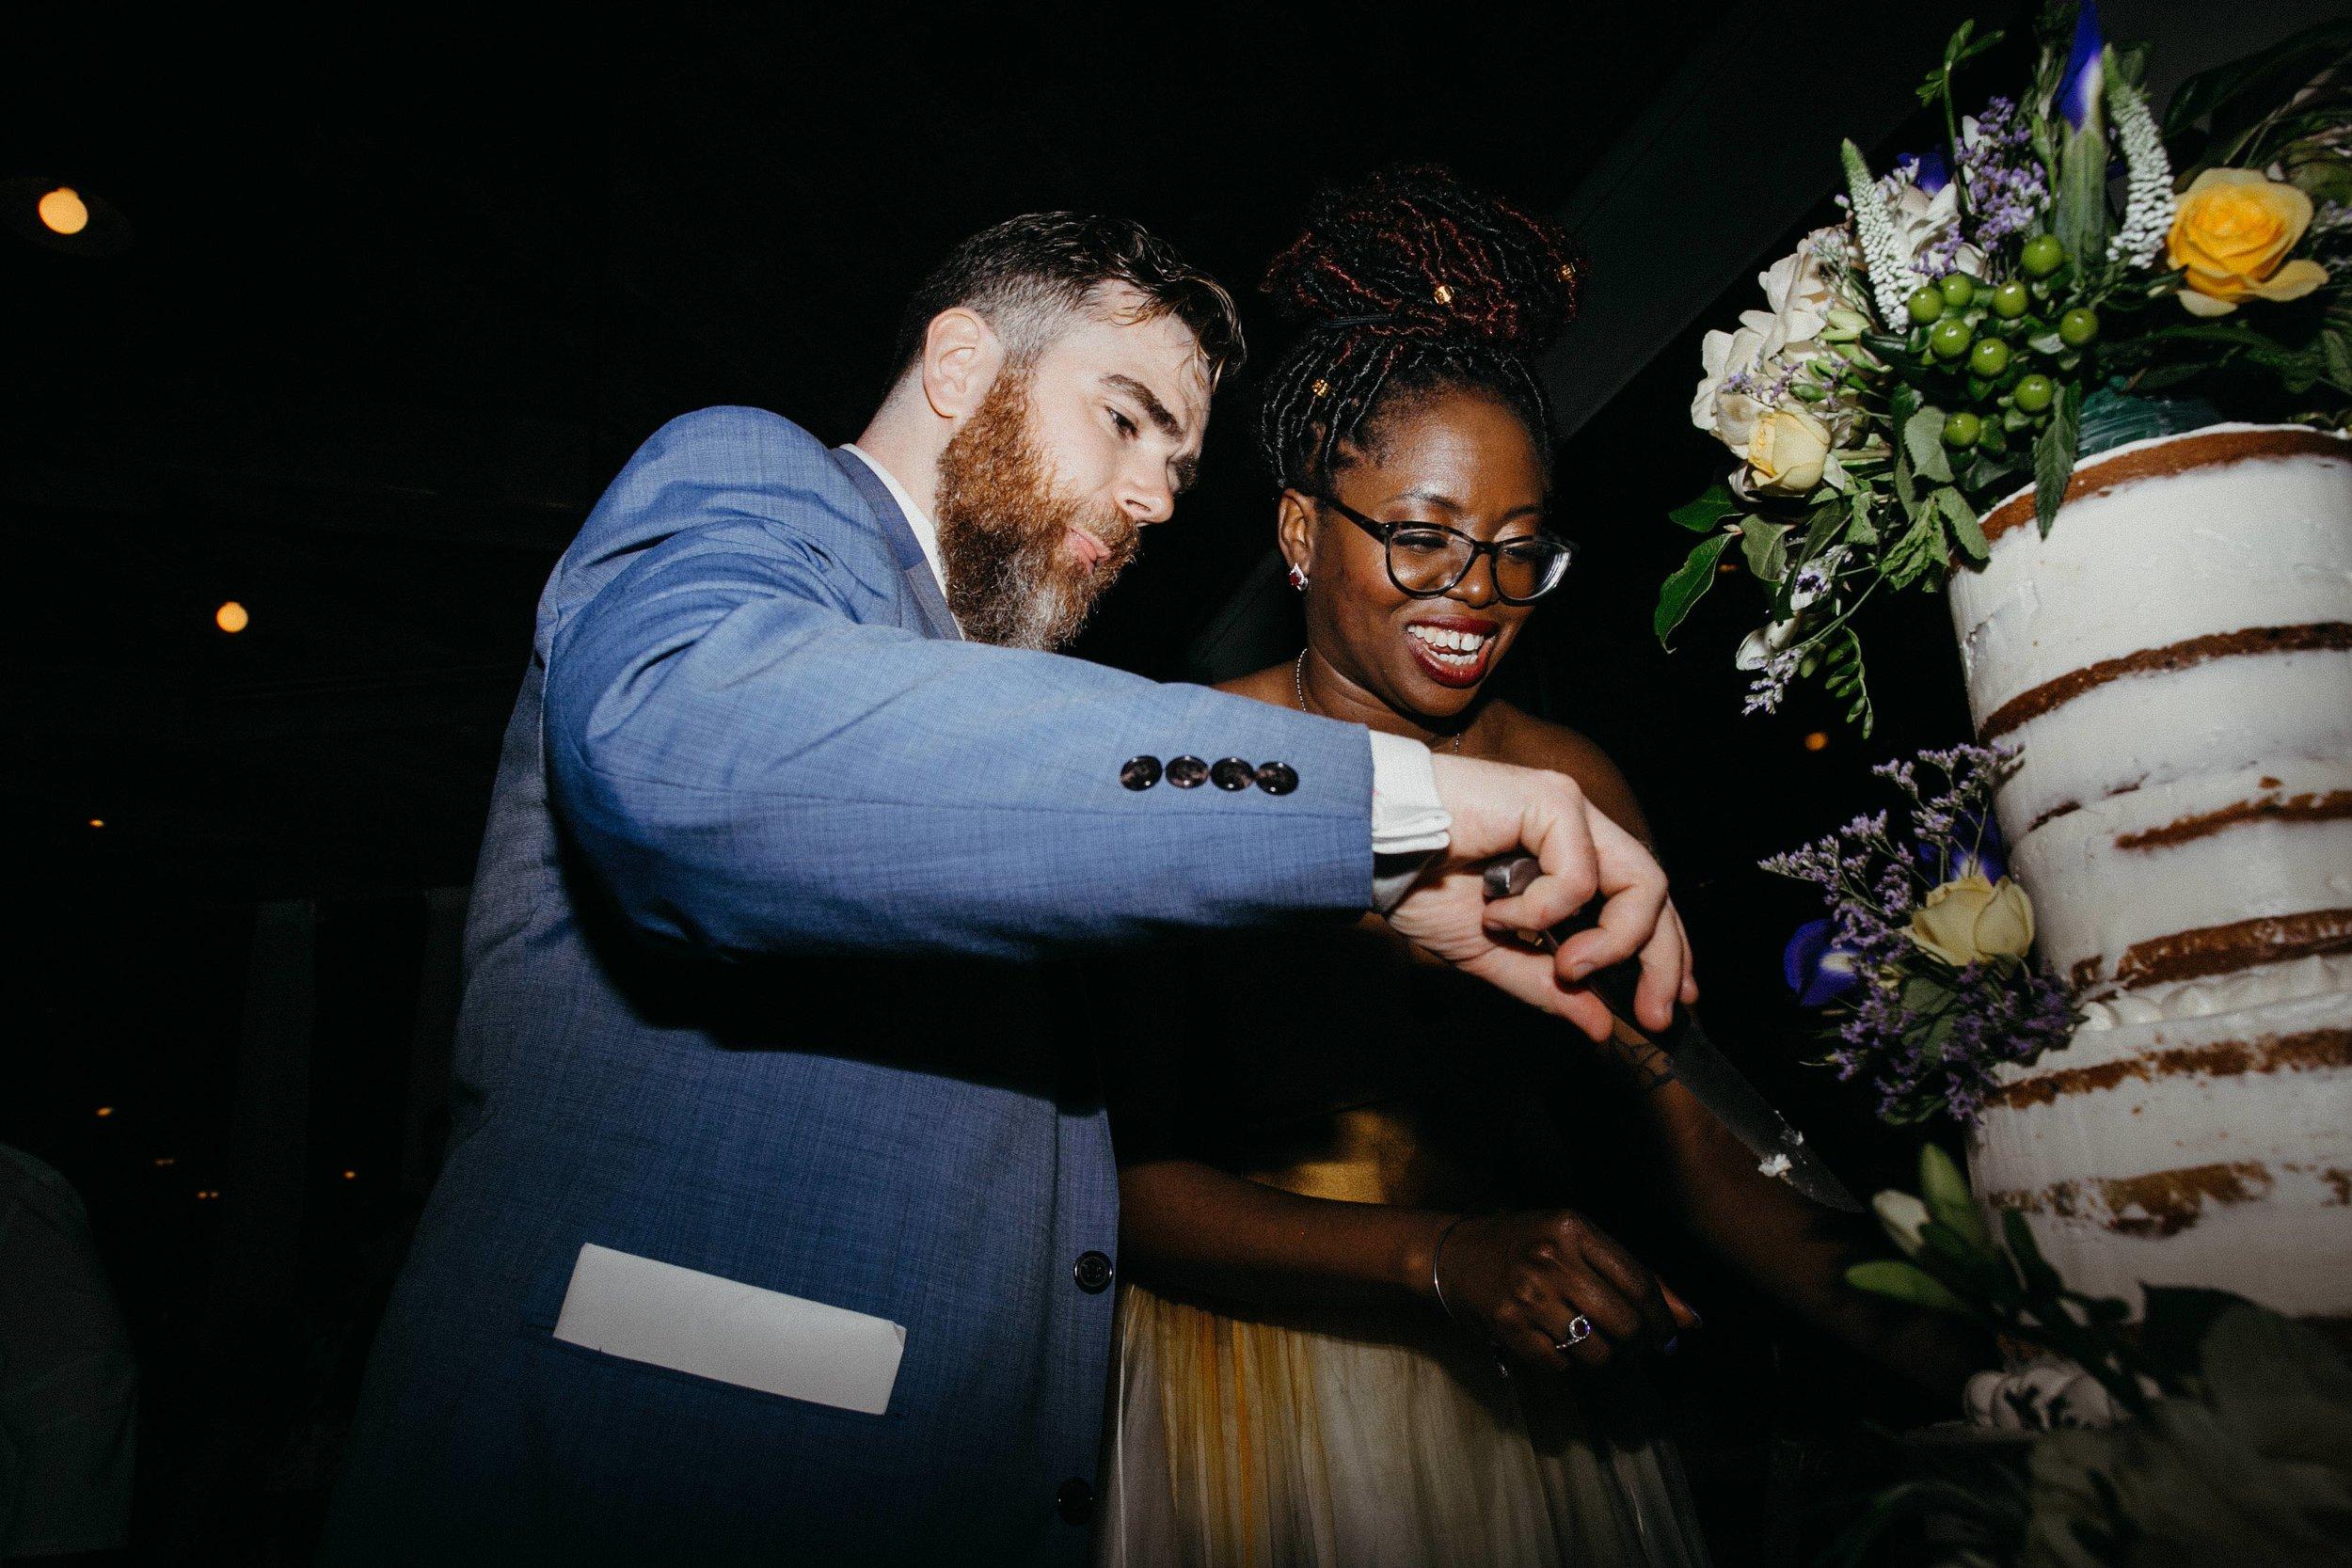 Sevlynn-Photography-Wedding-LIC-Landing-Maiella-NYC-67.jpg